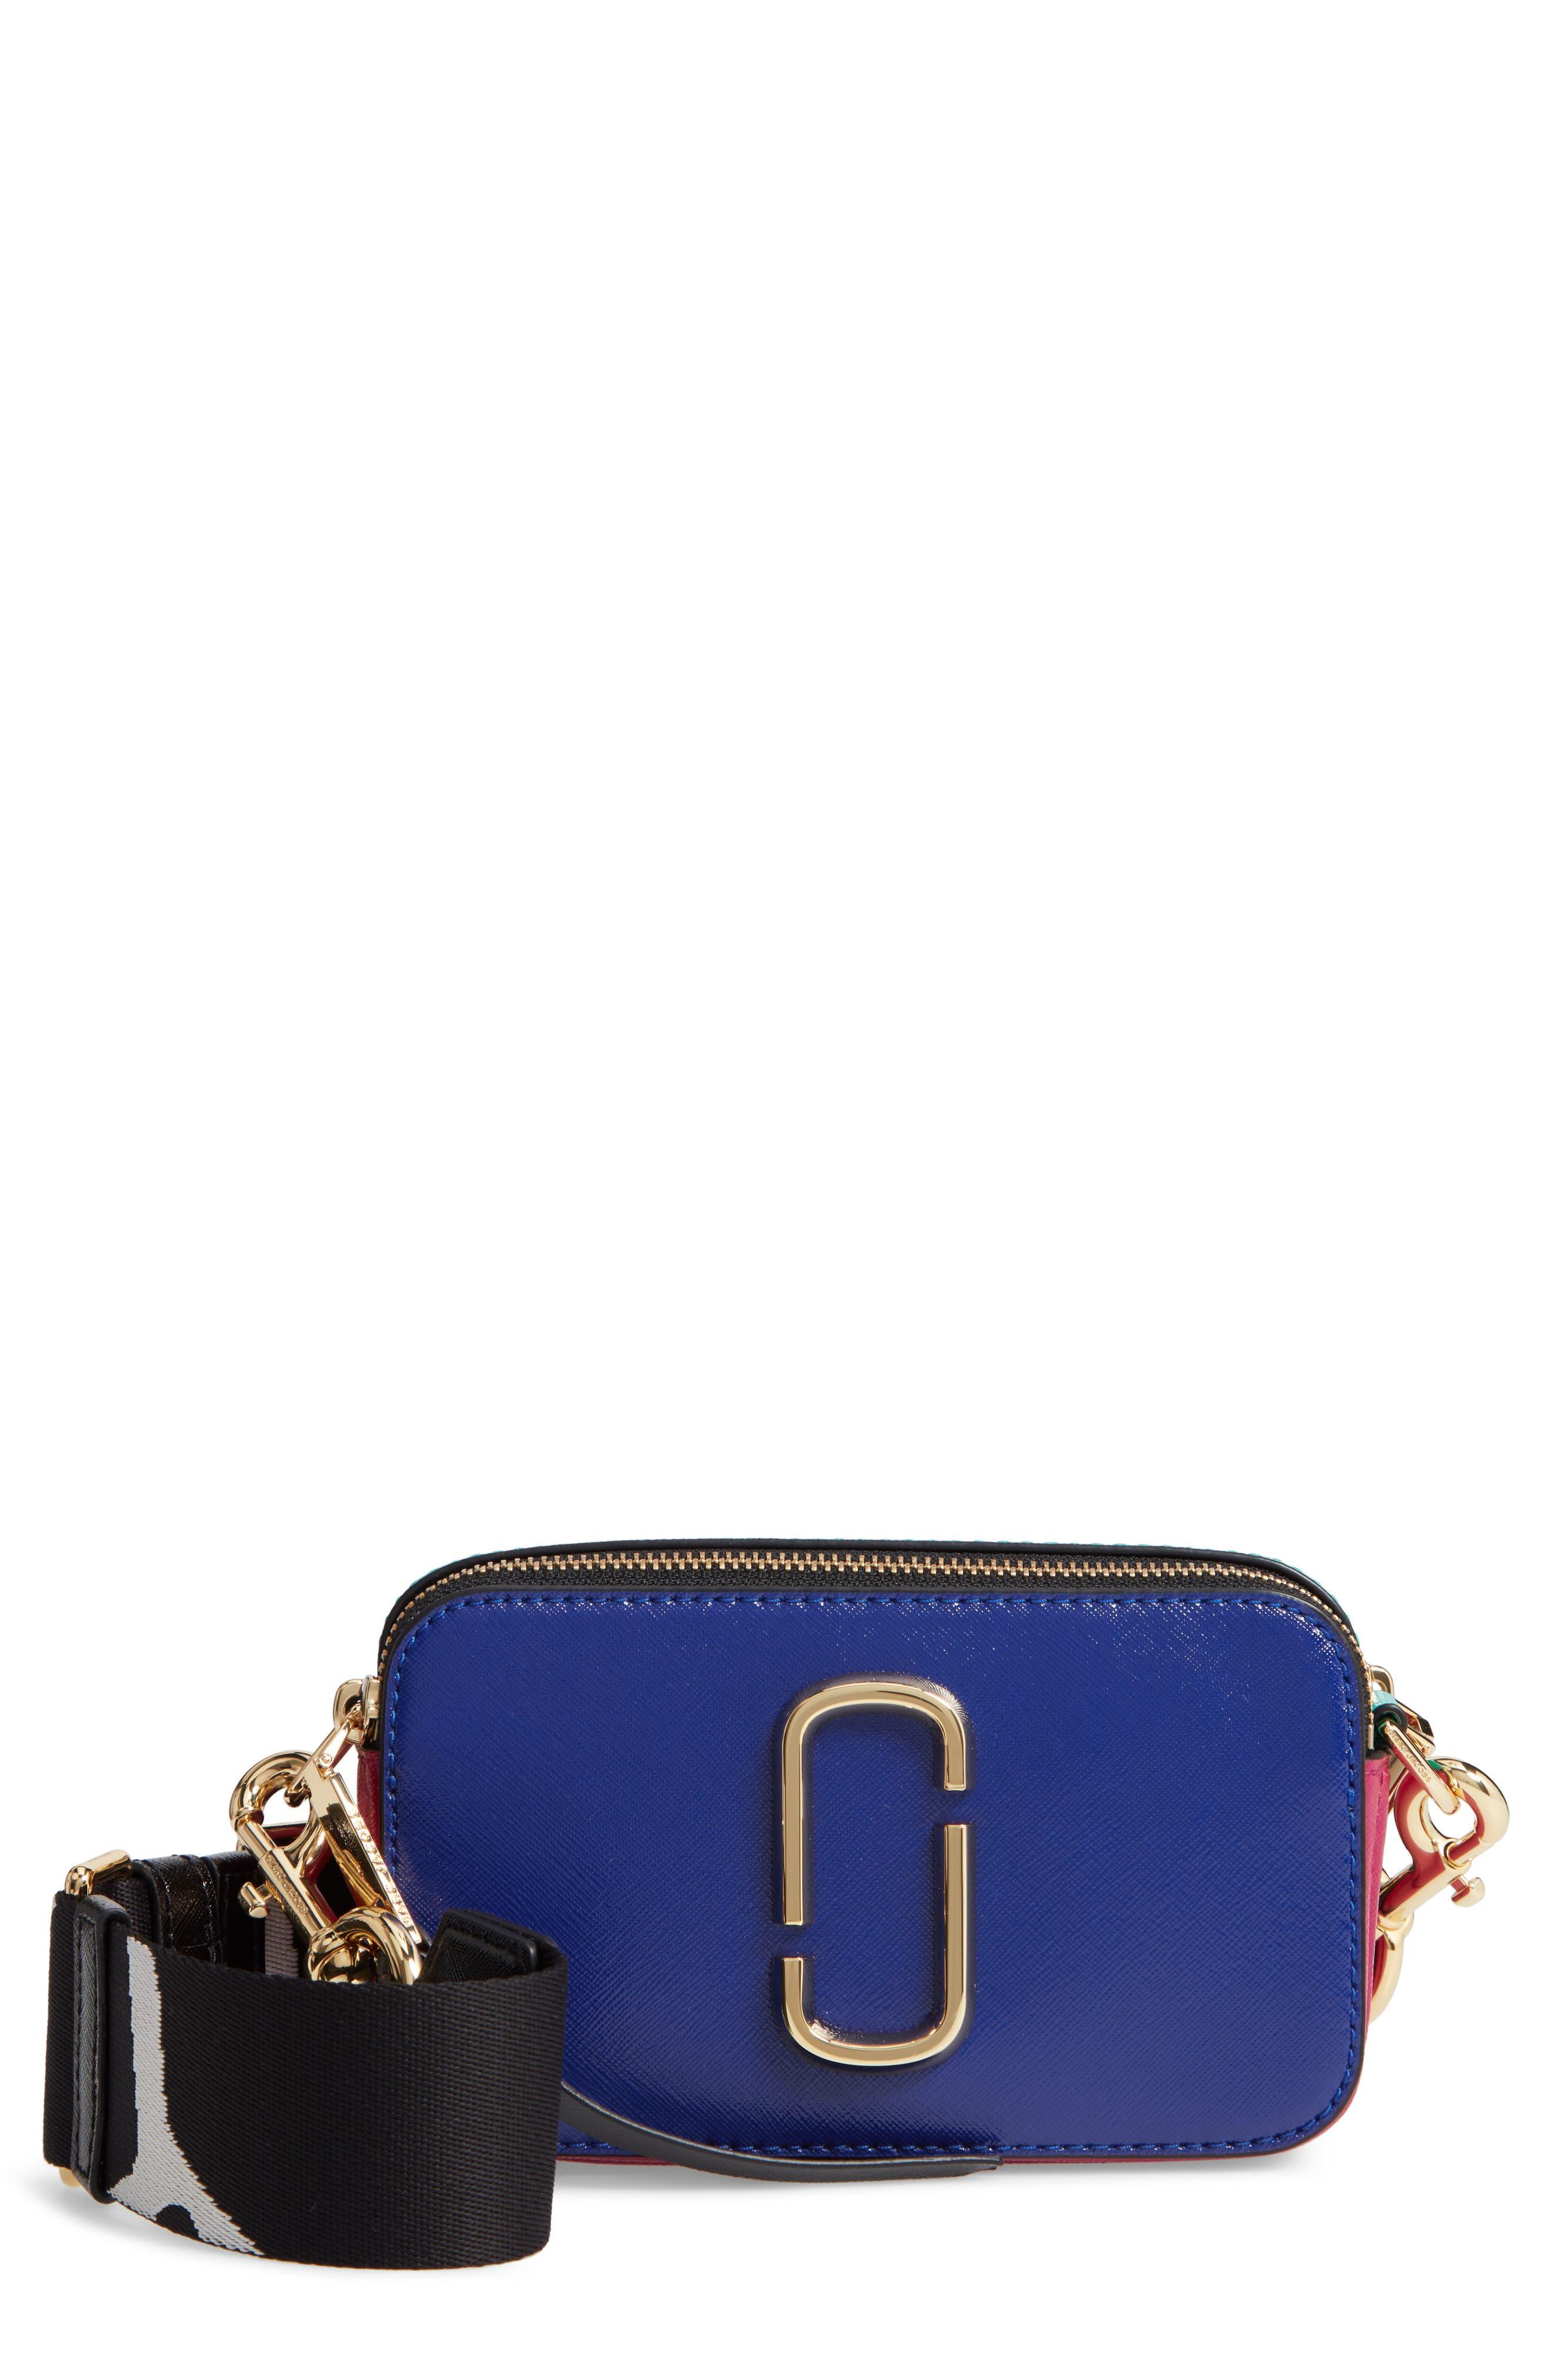 Snapshot Crossbody Bag,                             Main thumbnail 1, color,                             Academy Blue Multi